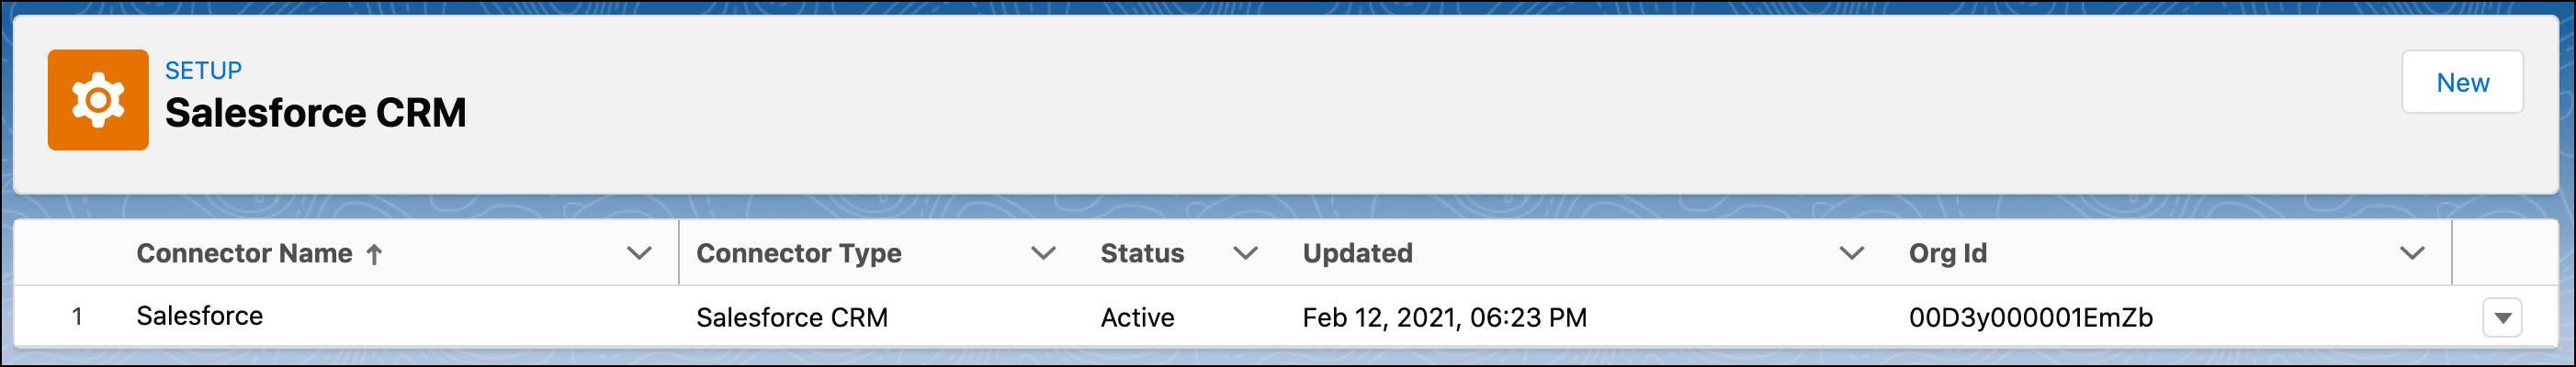 Setup page for Salesforce CRM.